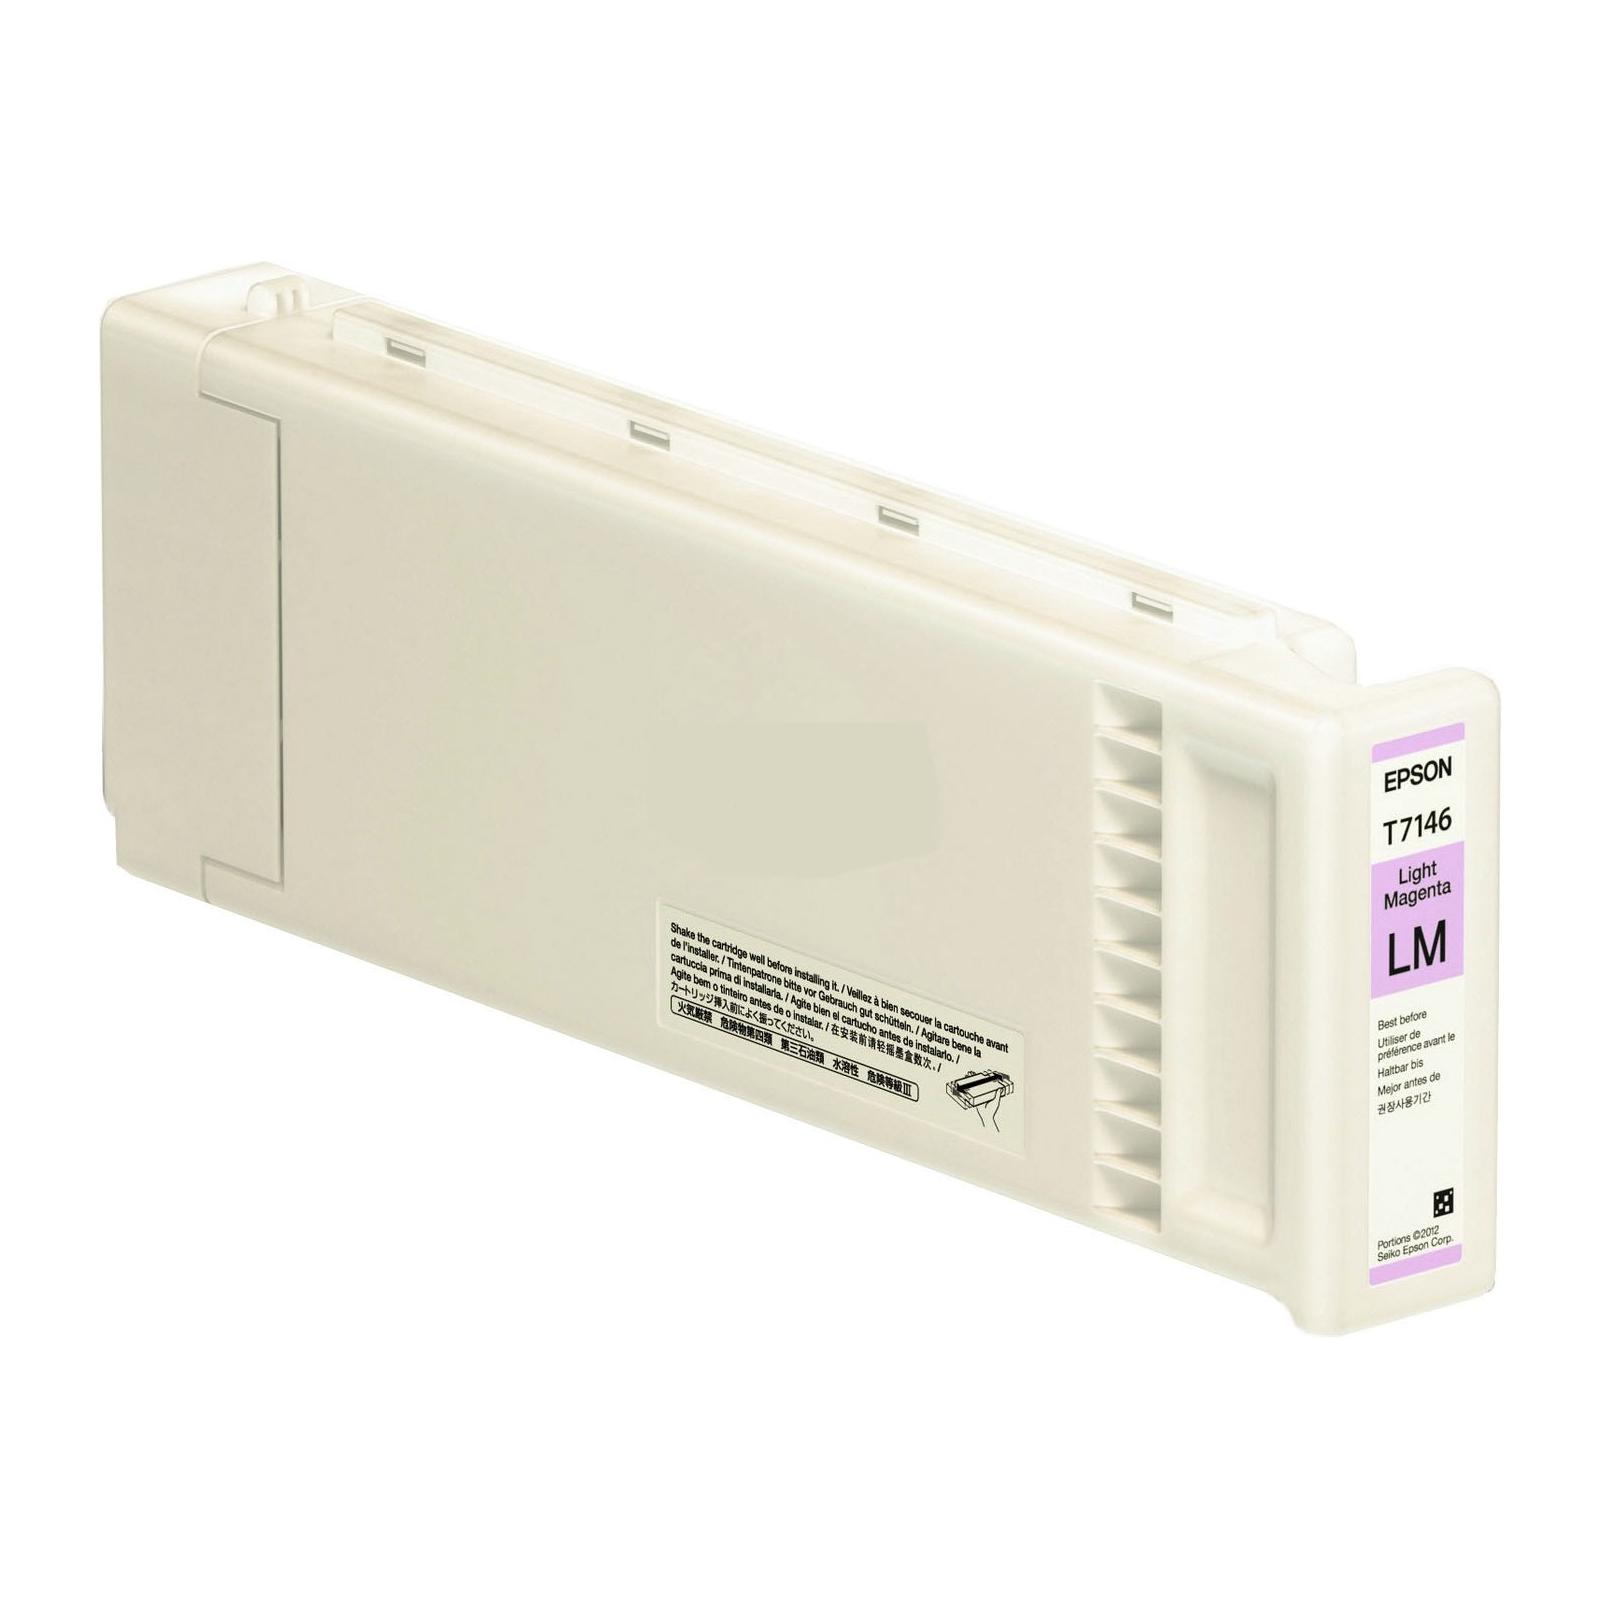 Картридж EPSON SureColor SC-S70610 light magenta (C13T714600)